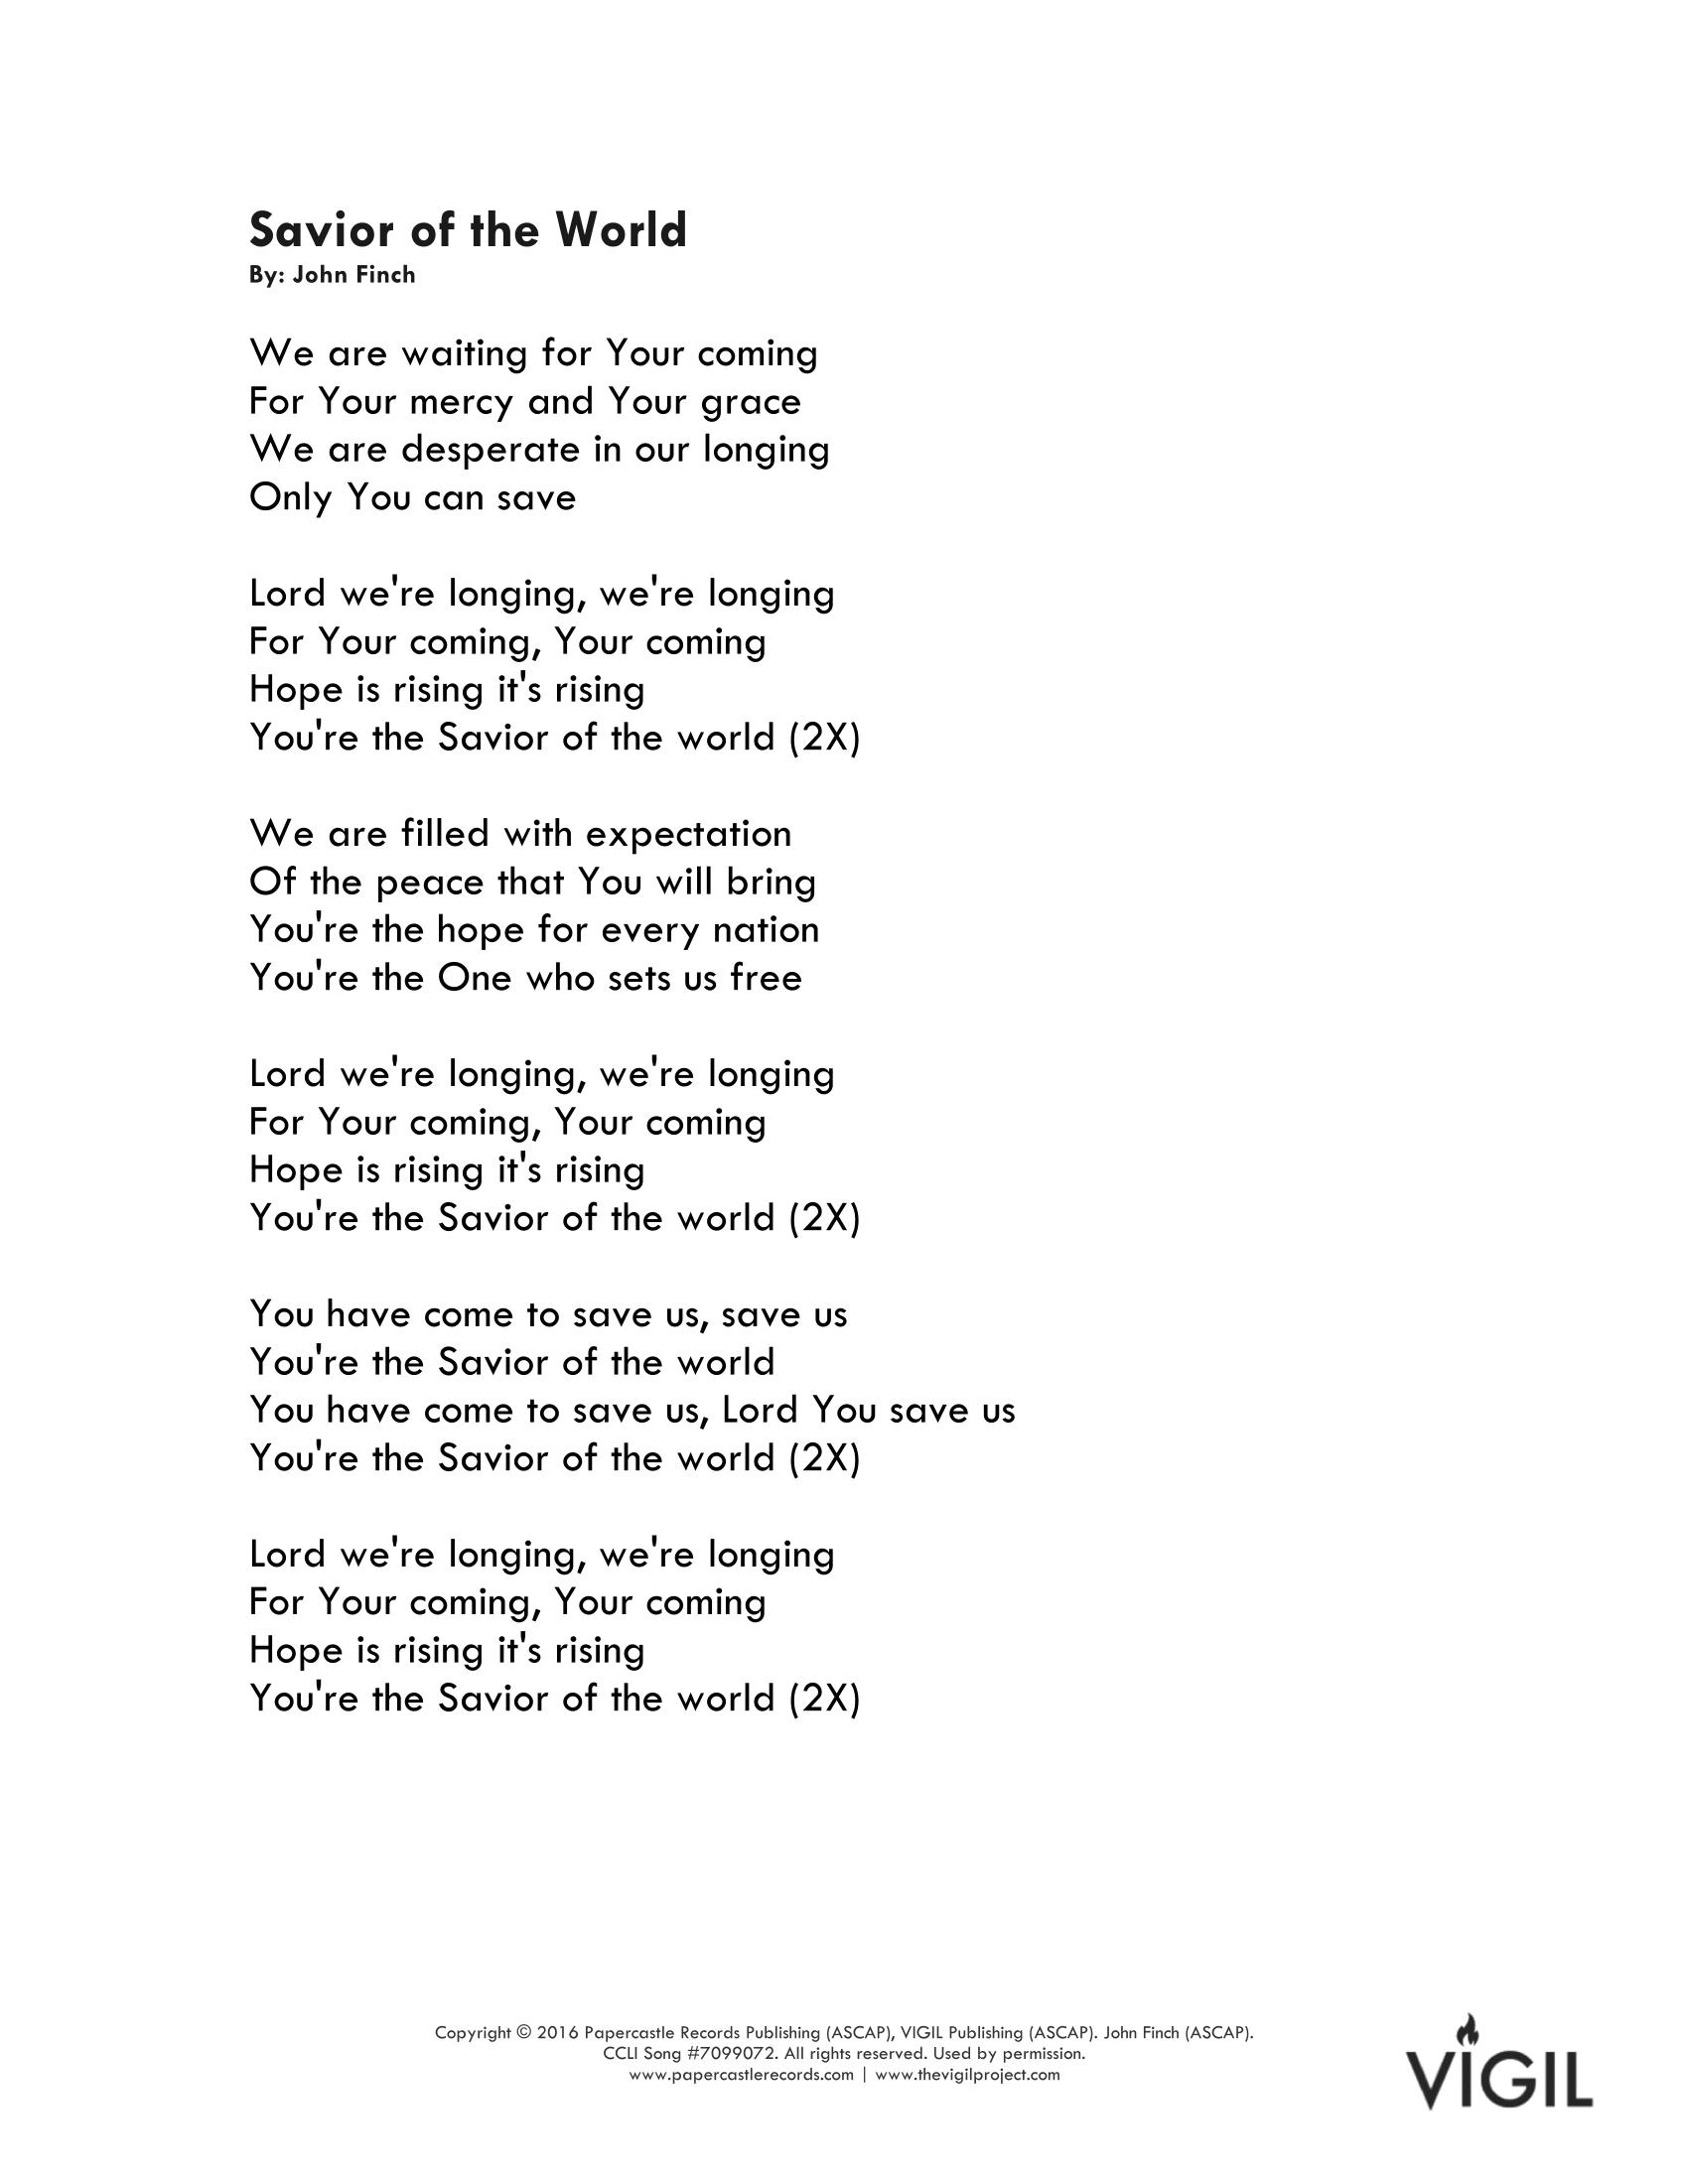 VIGIL S2 - Savior of the World (Lyrics)-1.png